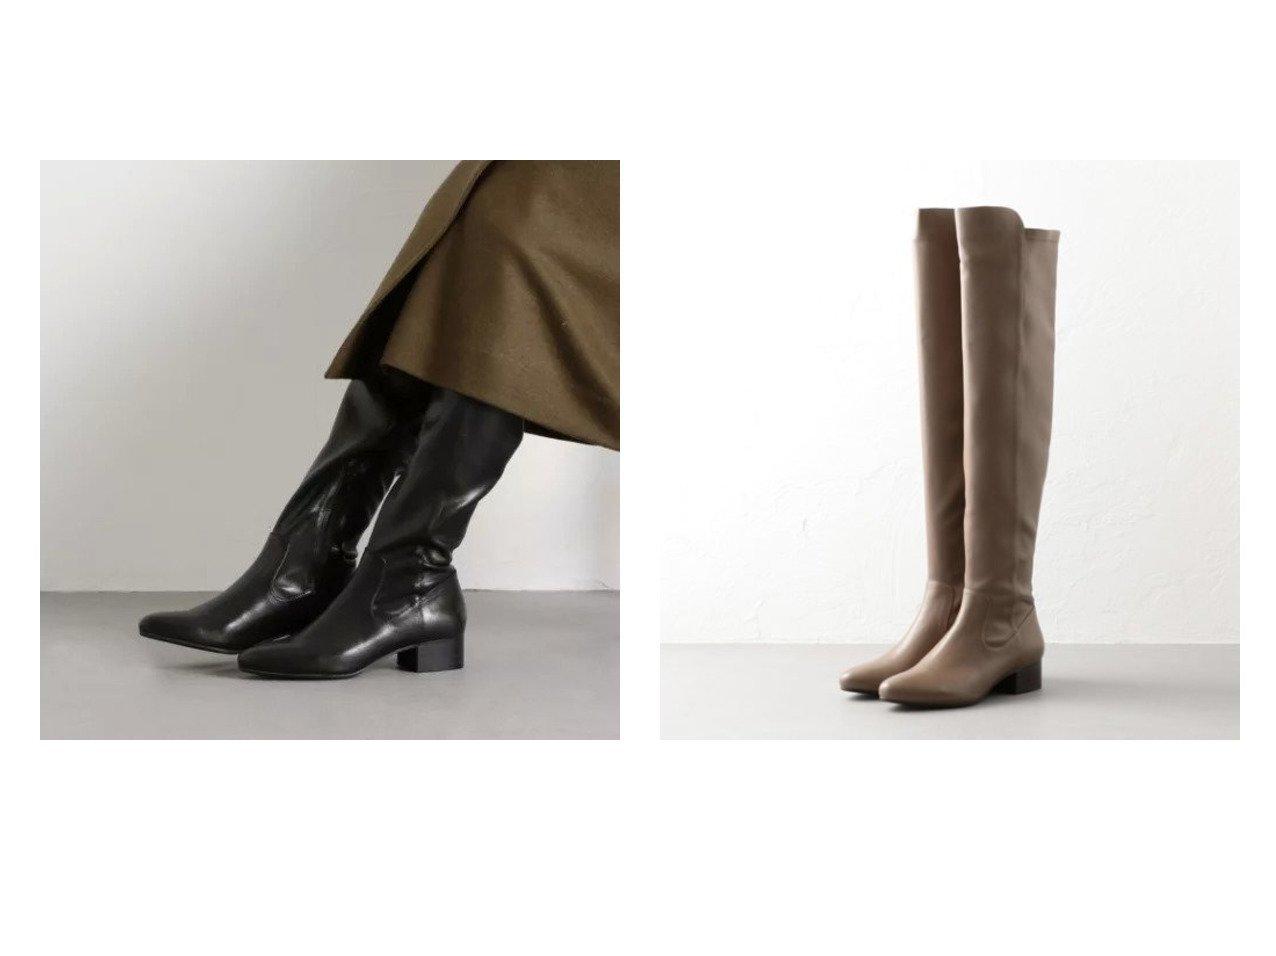 【Odette e Odile/オデット エ オディール】のOFC ストレッチニーハイ ロングブーツ40↑ シューズ・靴のおすすめ!人気、トレンド・レディースファッションの通販 おすすめで人気の流行・トレンド、ファッションの通販商品 メンズファッション・キッズファッション・インテリア・家具・レディースファッション・服の通販 founy(ファニー) https://founy.com/ ファッション Fashion レディースファッション WOMEN シューズ シンプル ハーフ フィット ロング  ID:crp329100000012467